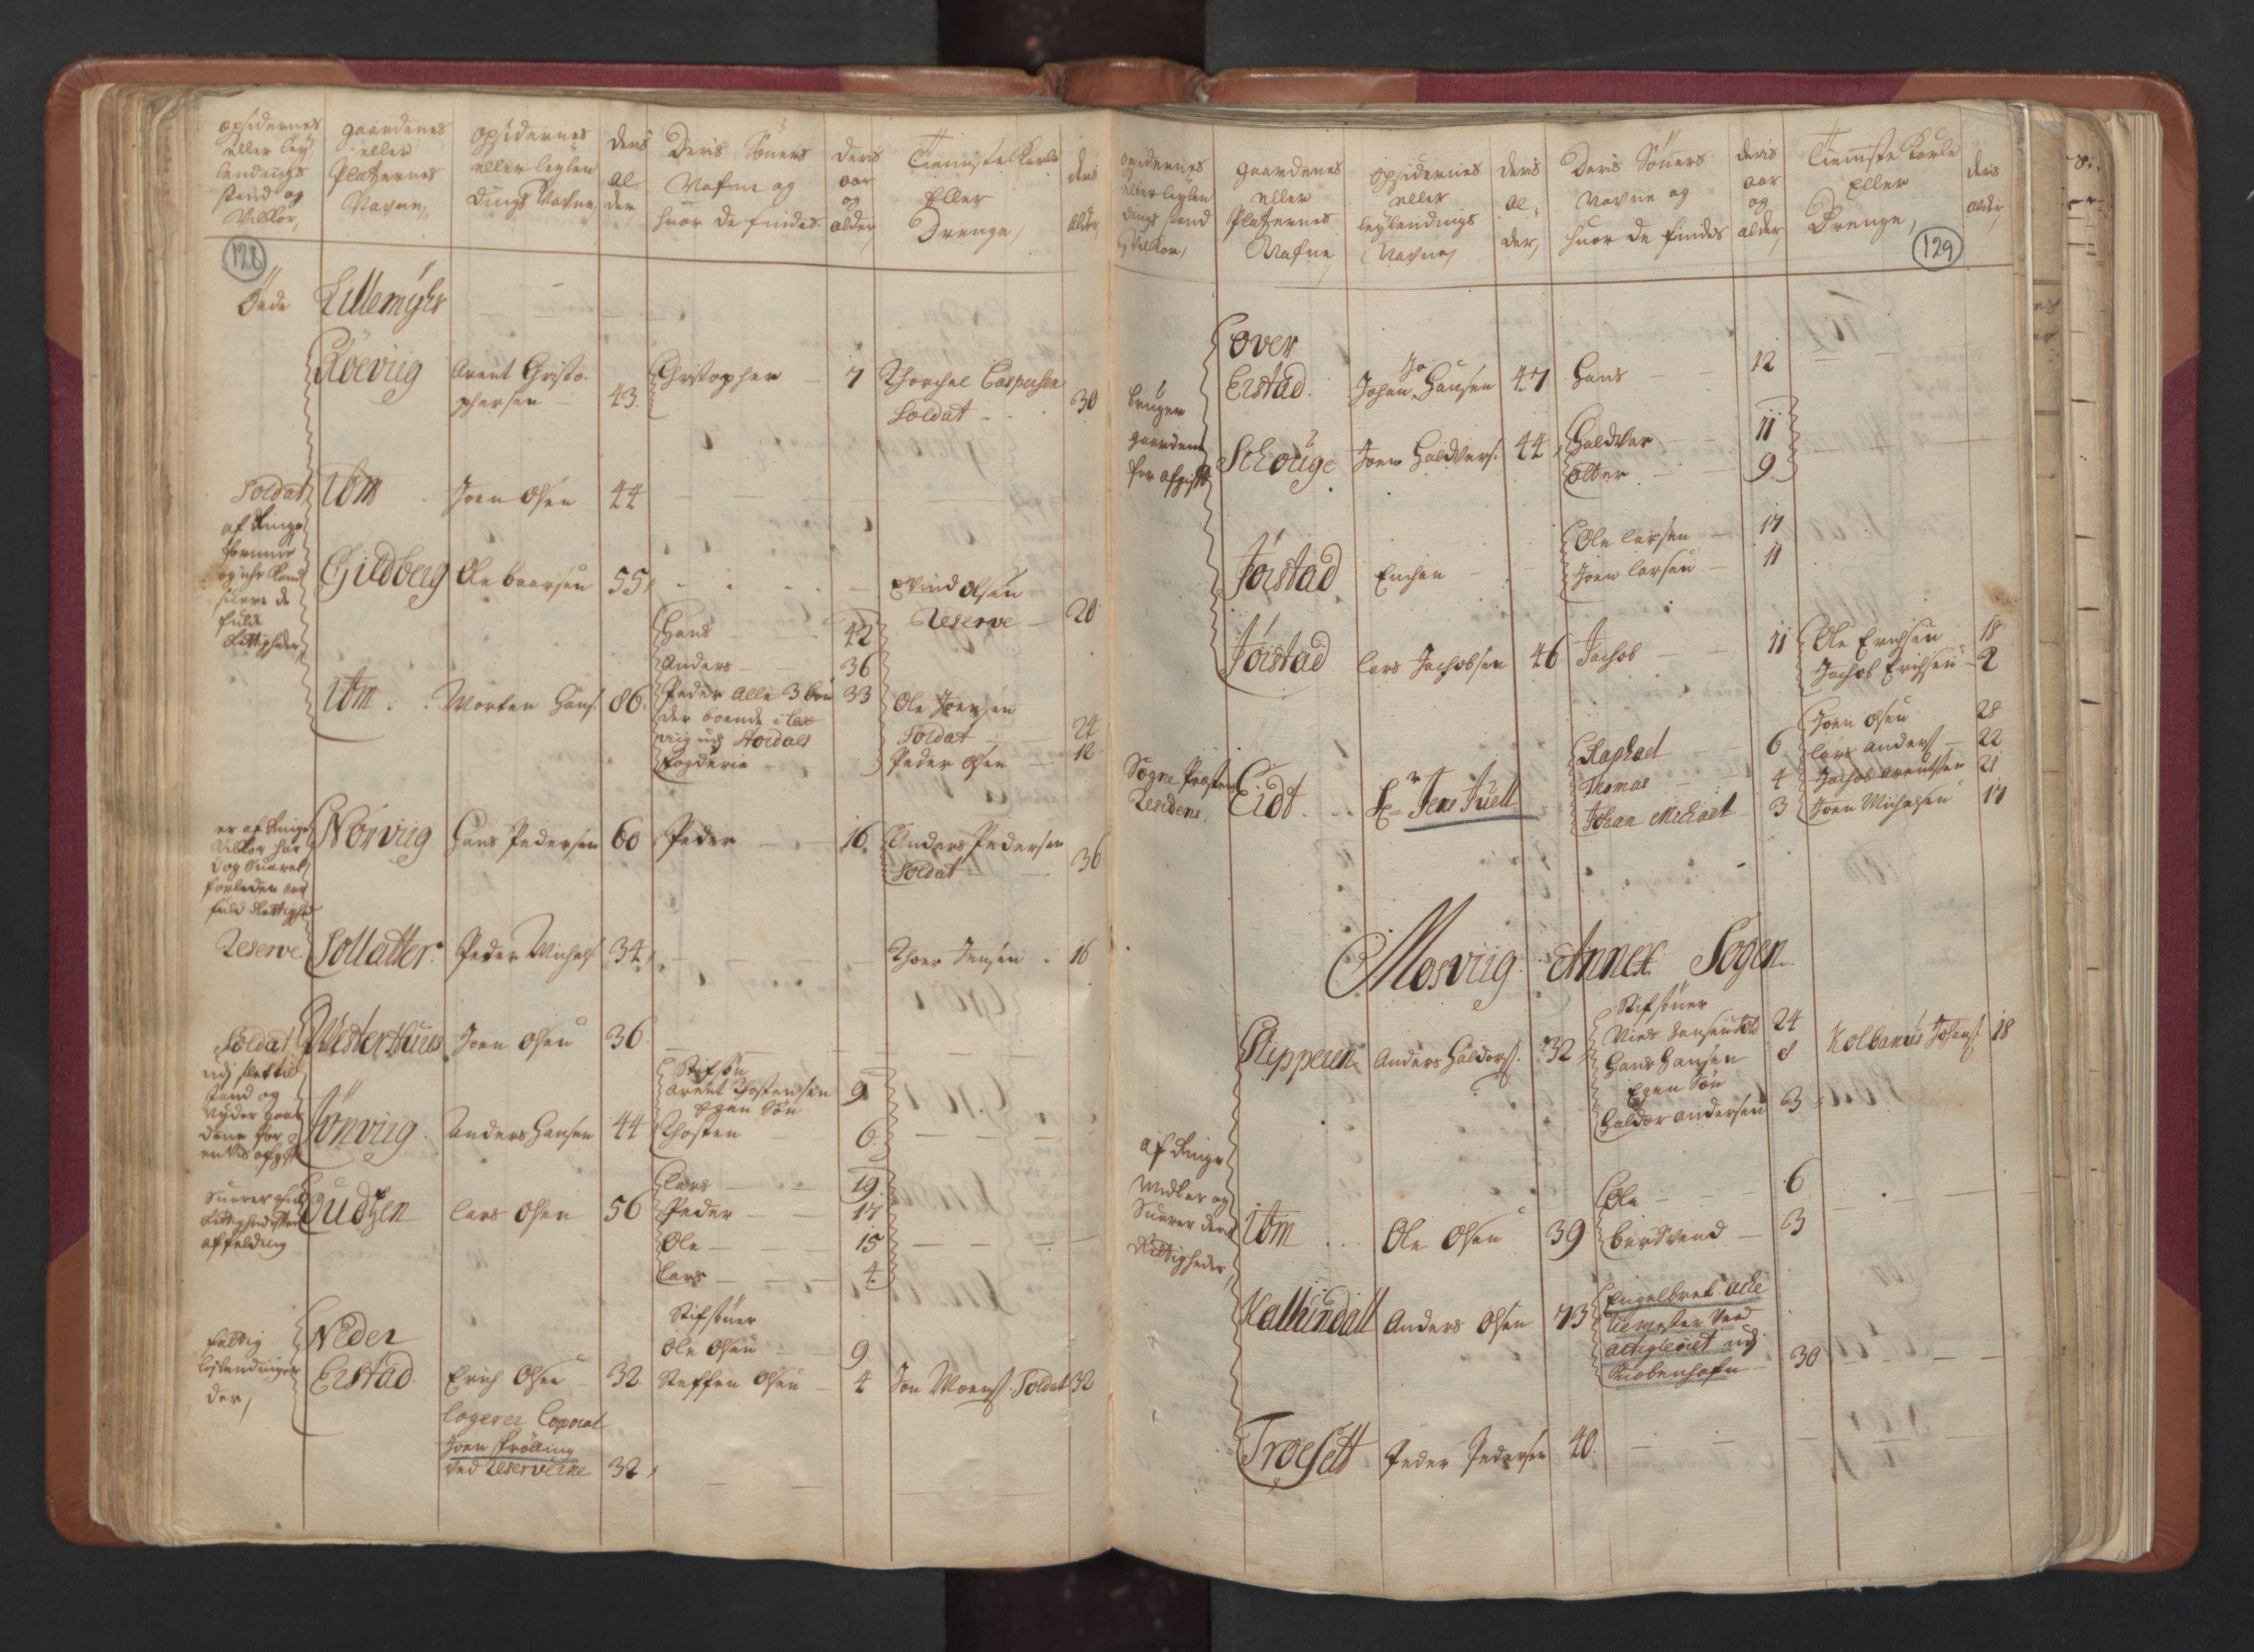 RA, Manntallet 1701, nr. 15: Inderøy fogderi og Namdal fogderi, 1701, s. 128-129